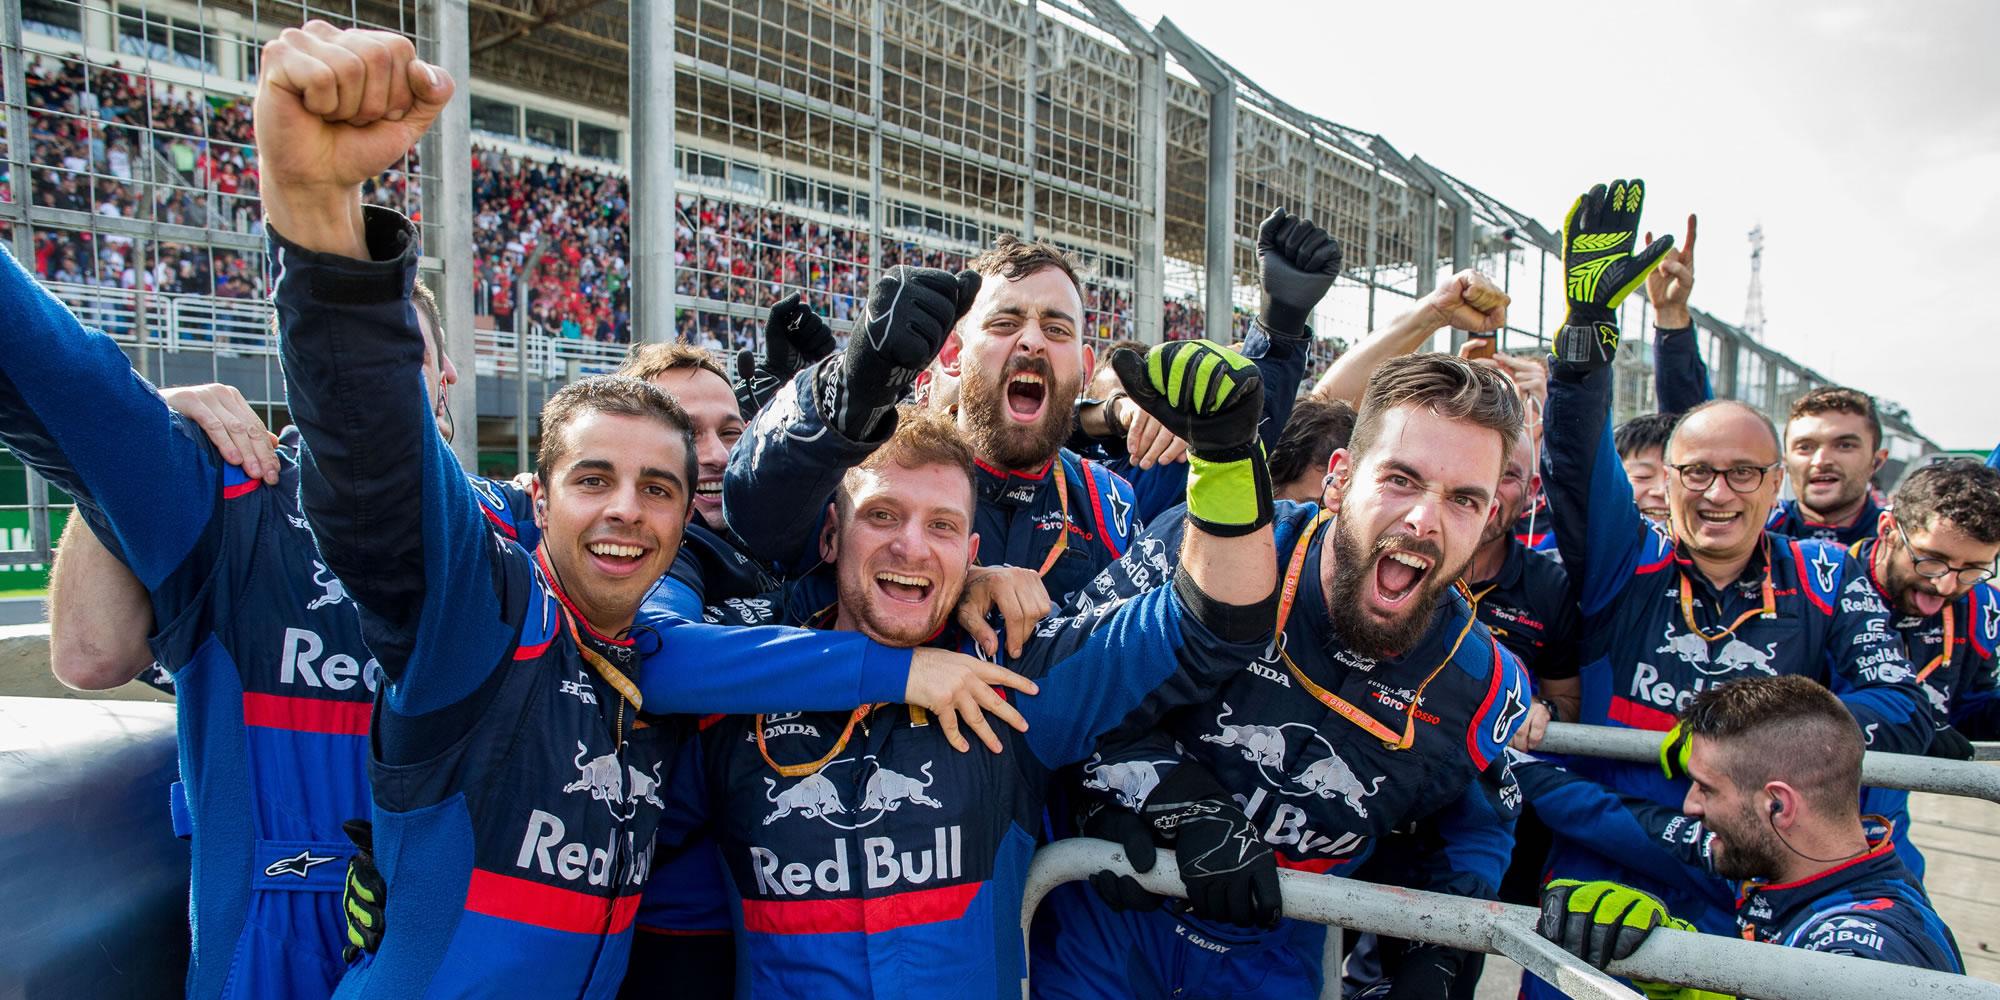 Brazil GP 2019 – Podium! 3